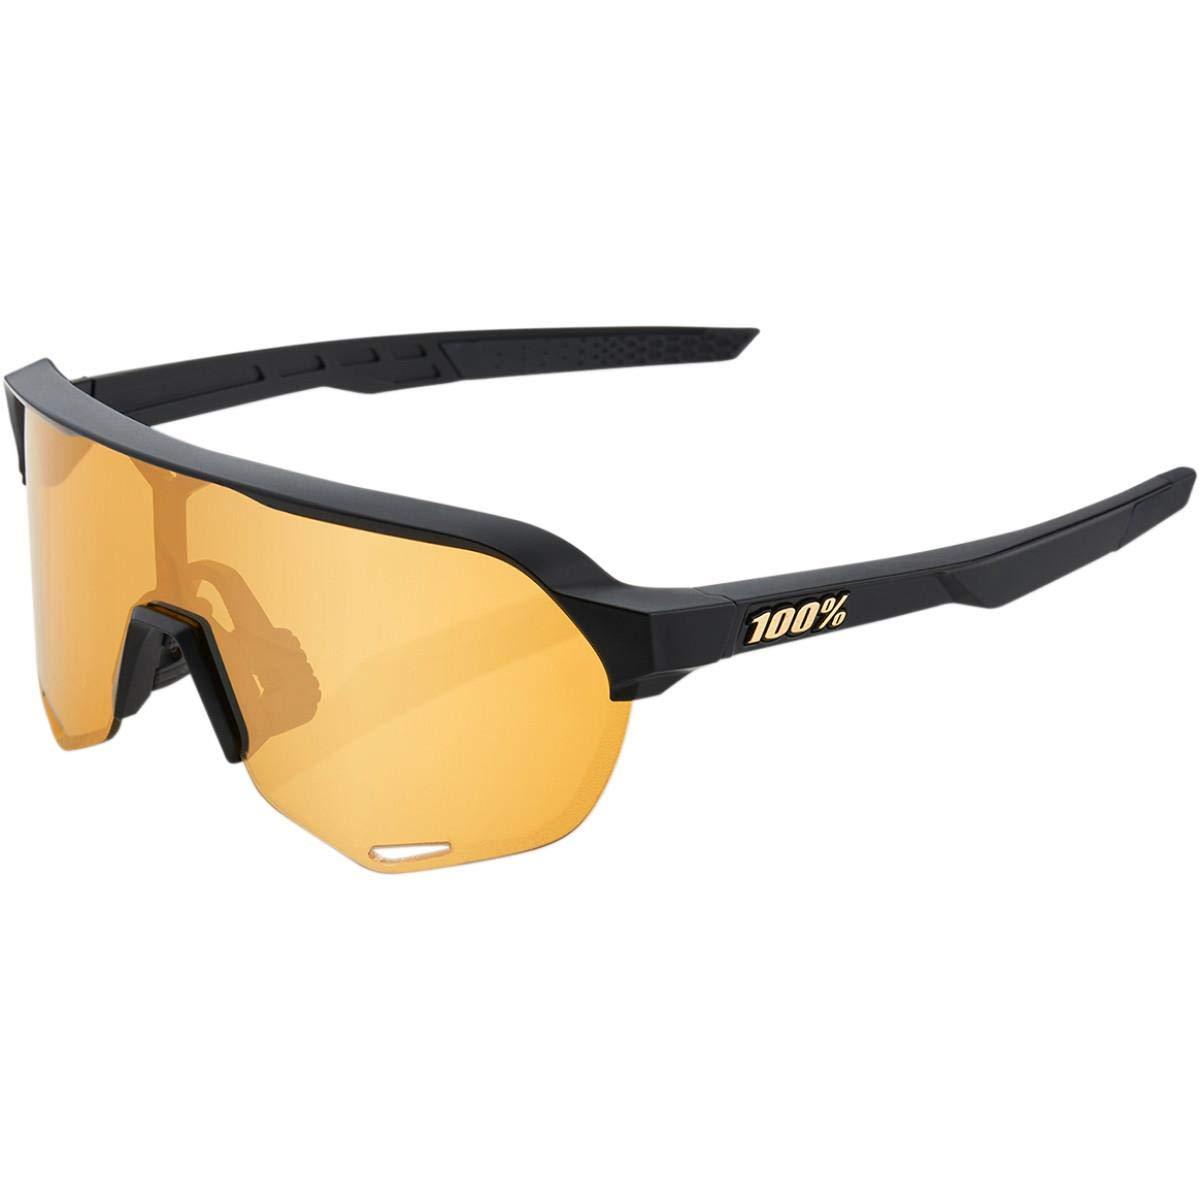 100/% S2 Sunglasses Matte Black//Soft Gold Lens